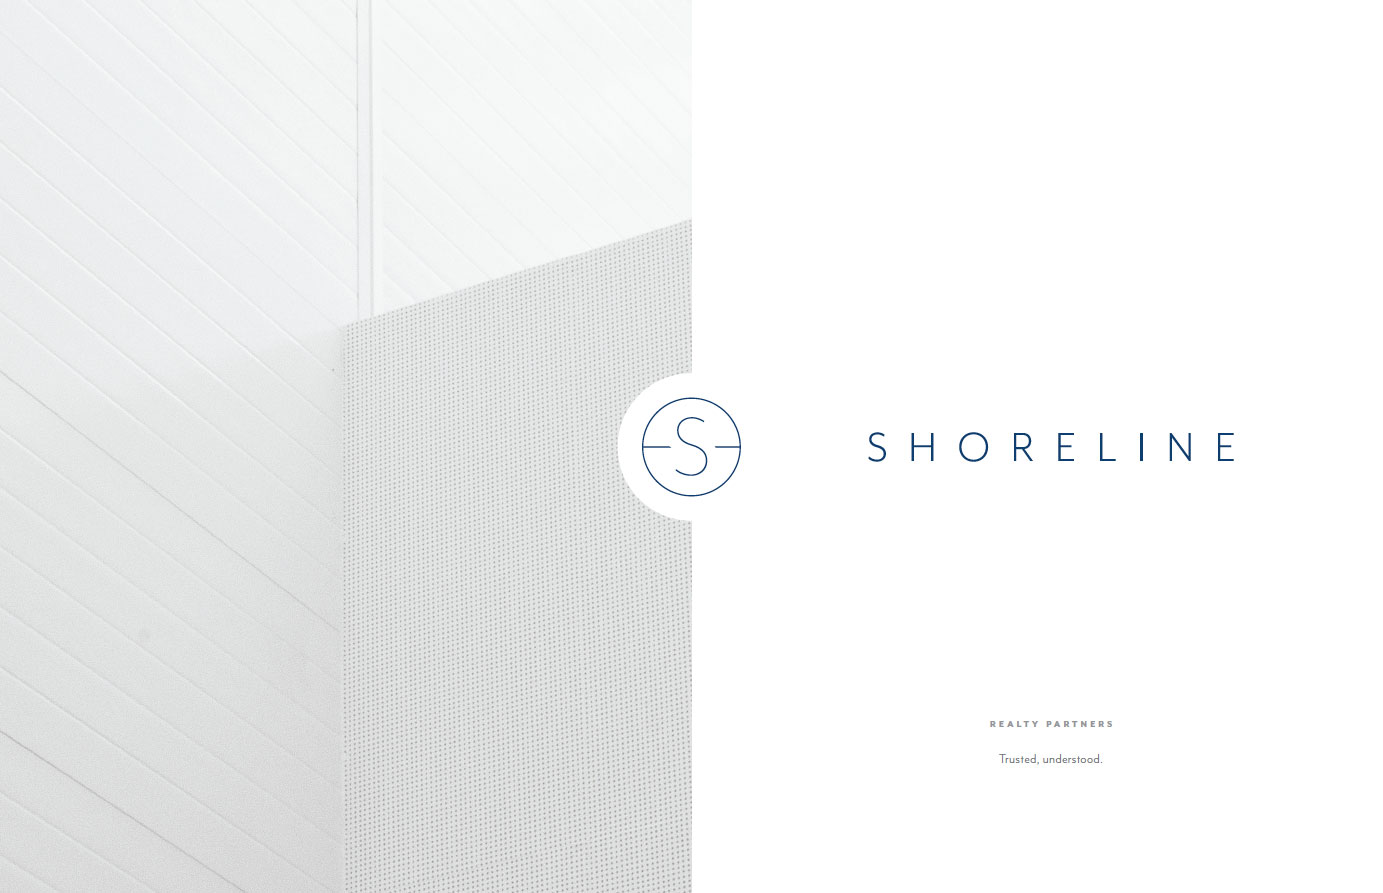 Shoreline Realty Partners Branding